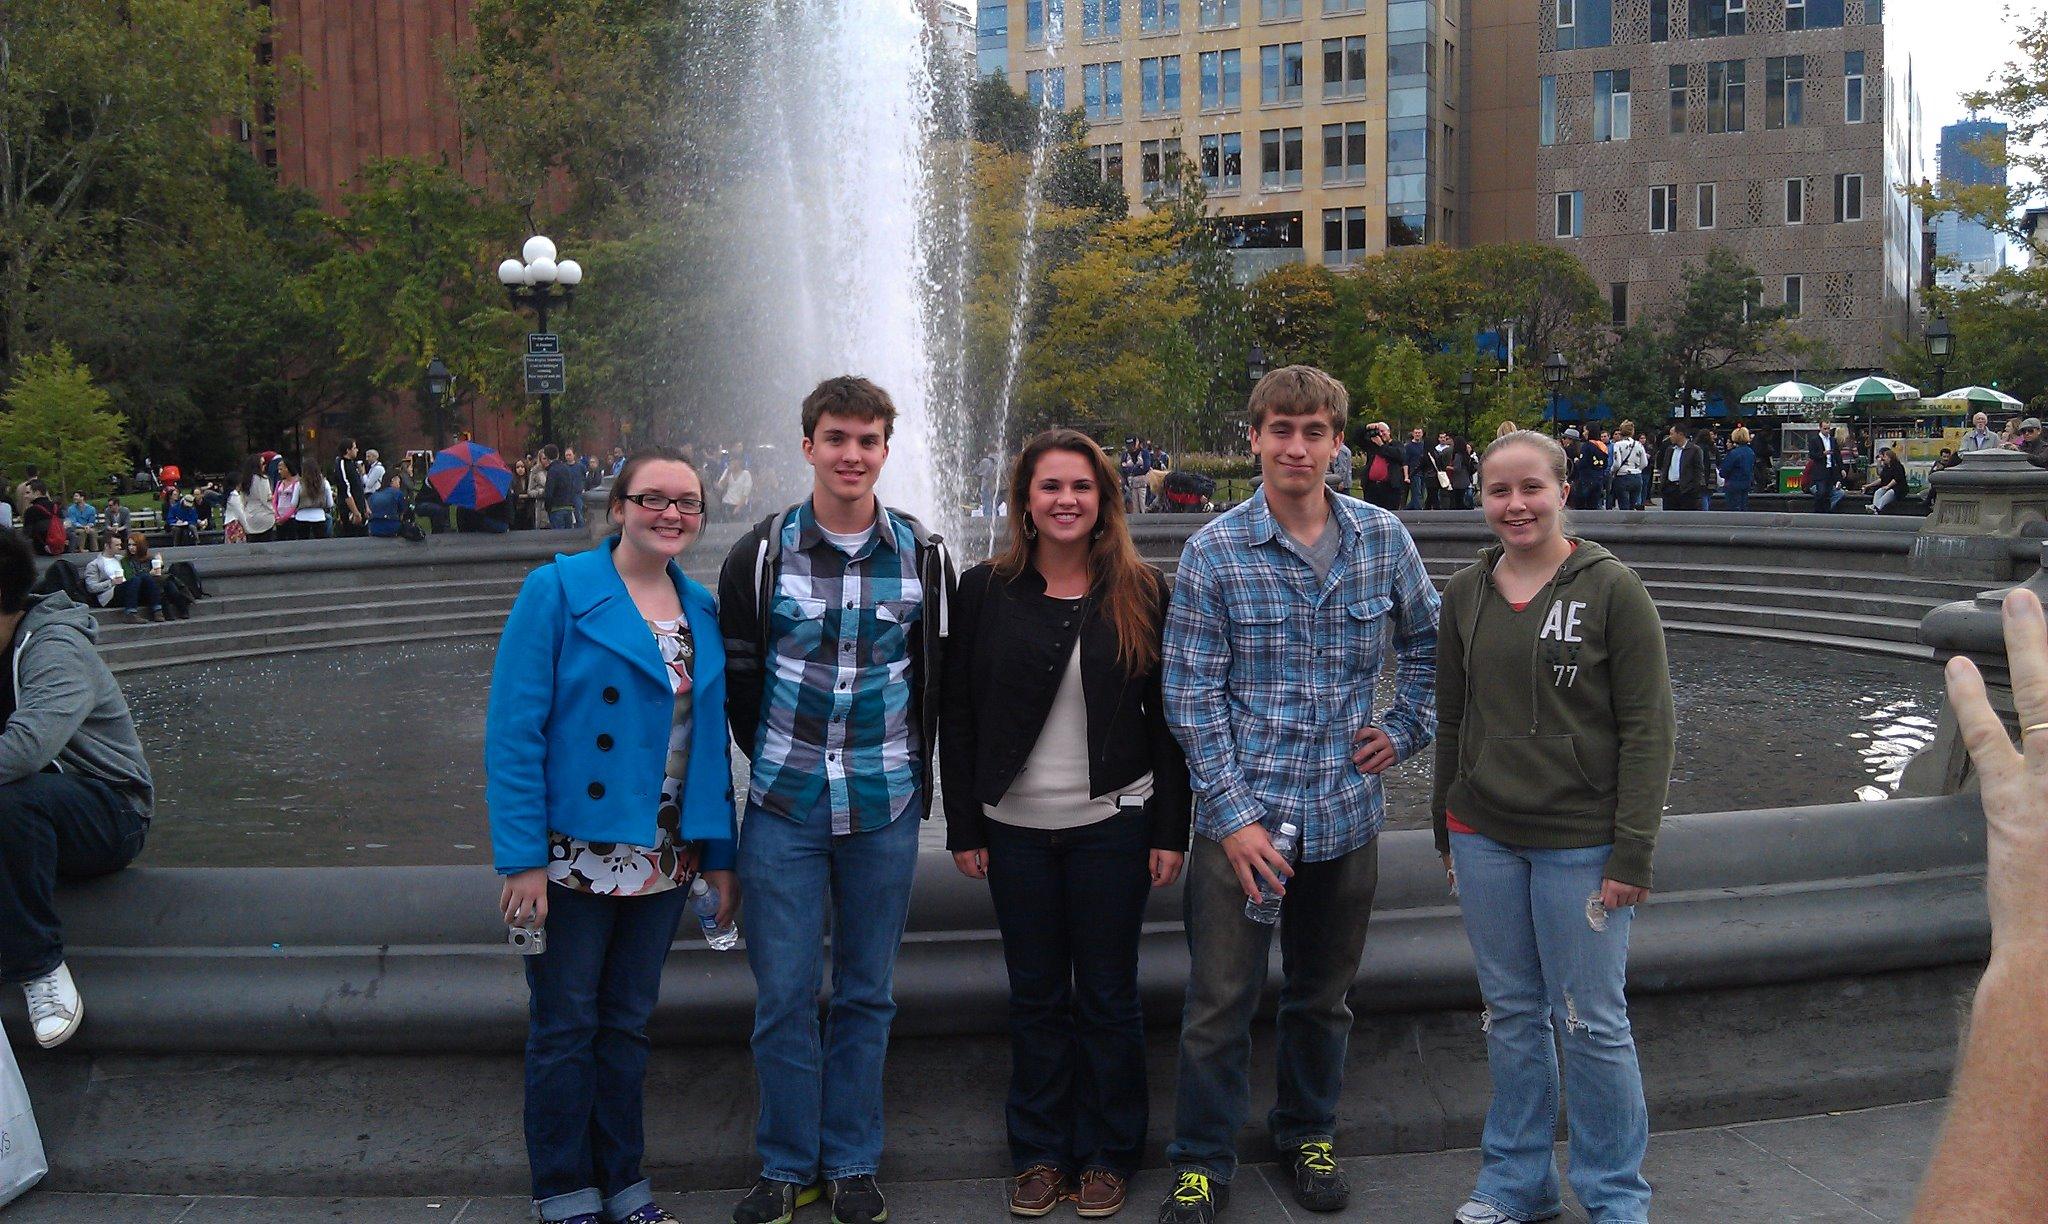 Class of 2012- (l to r): Mattie Blair, Brendan Gleason, Emily Hoag, Michael Merwin, Lauren Conte